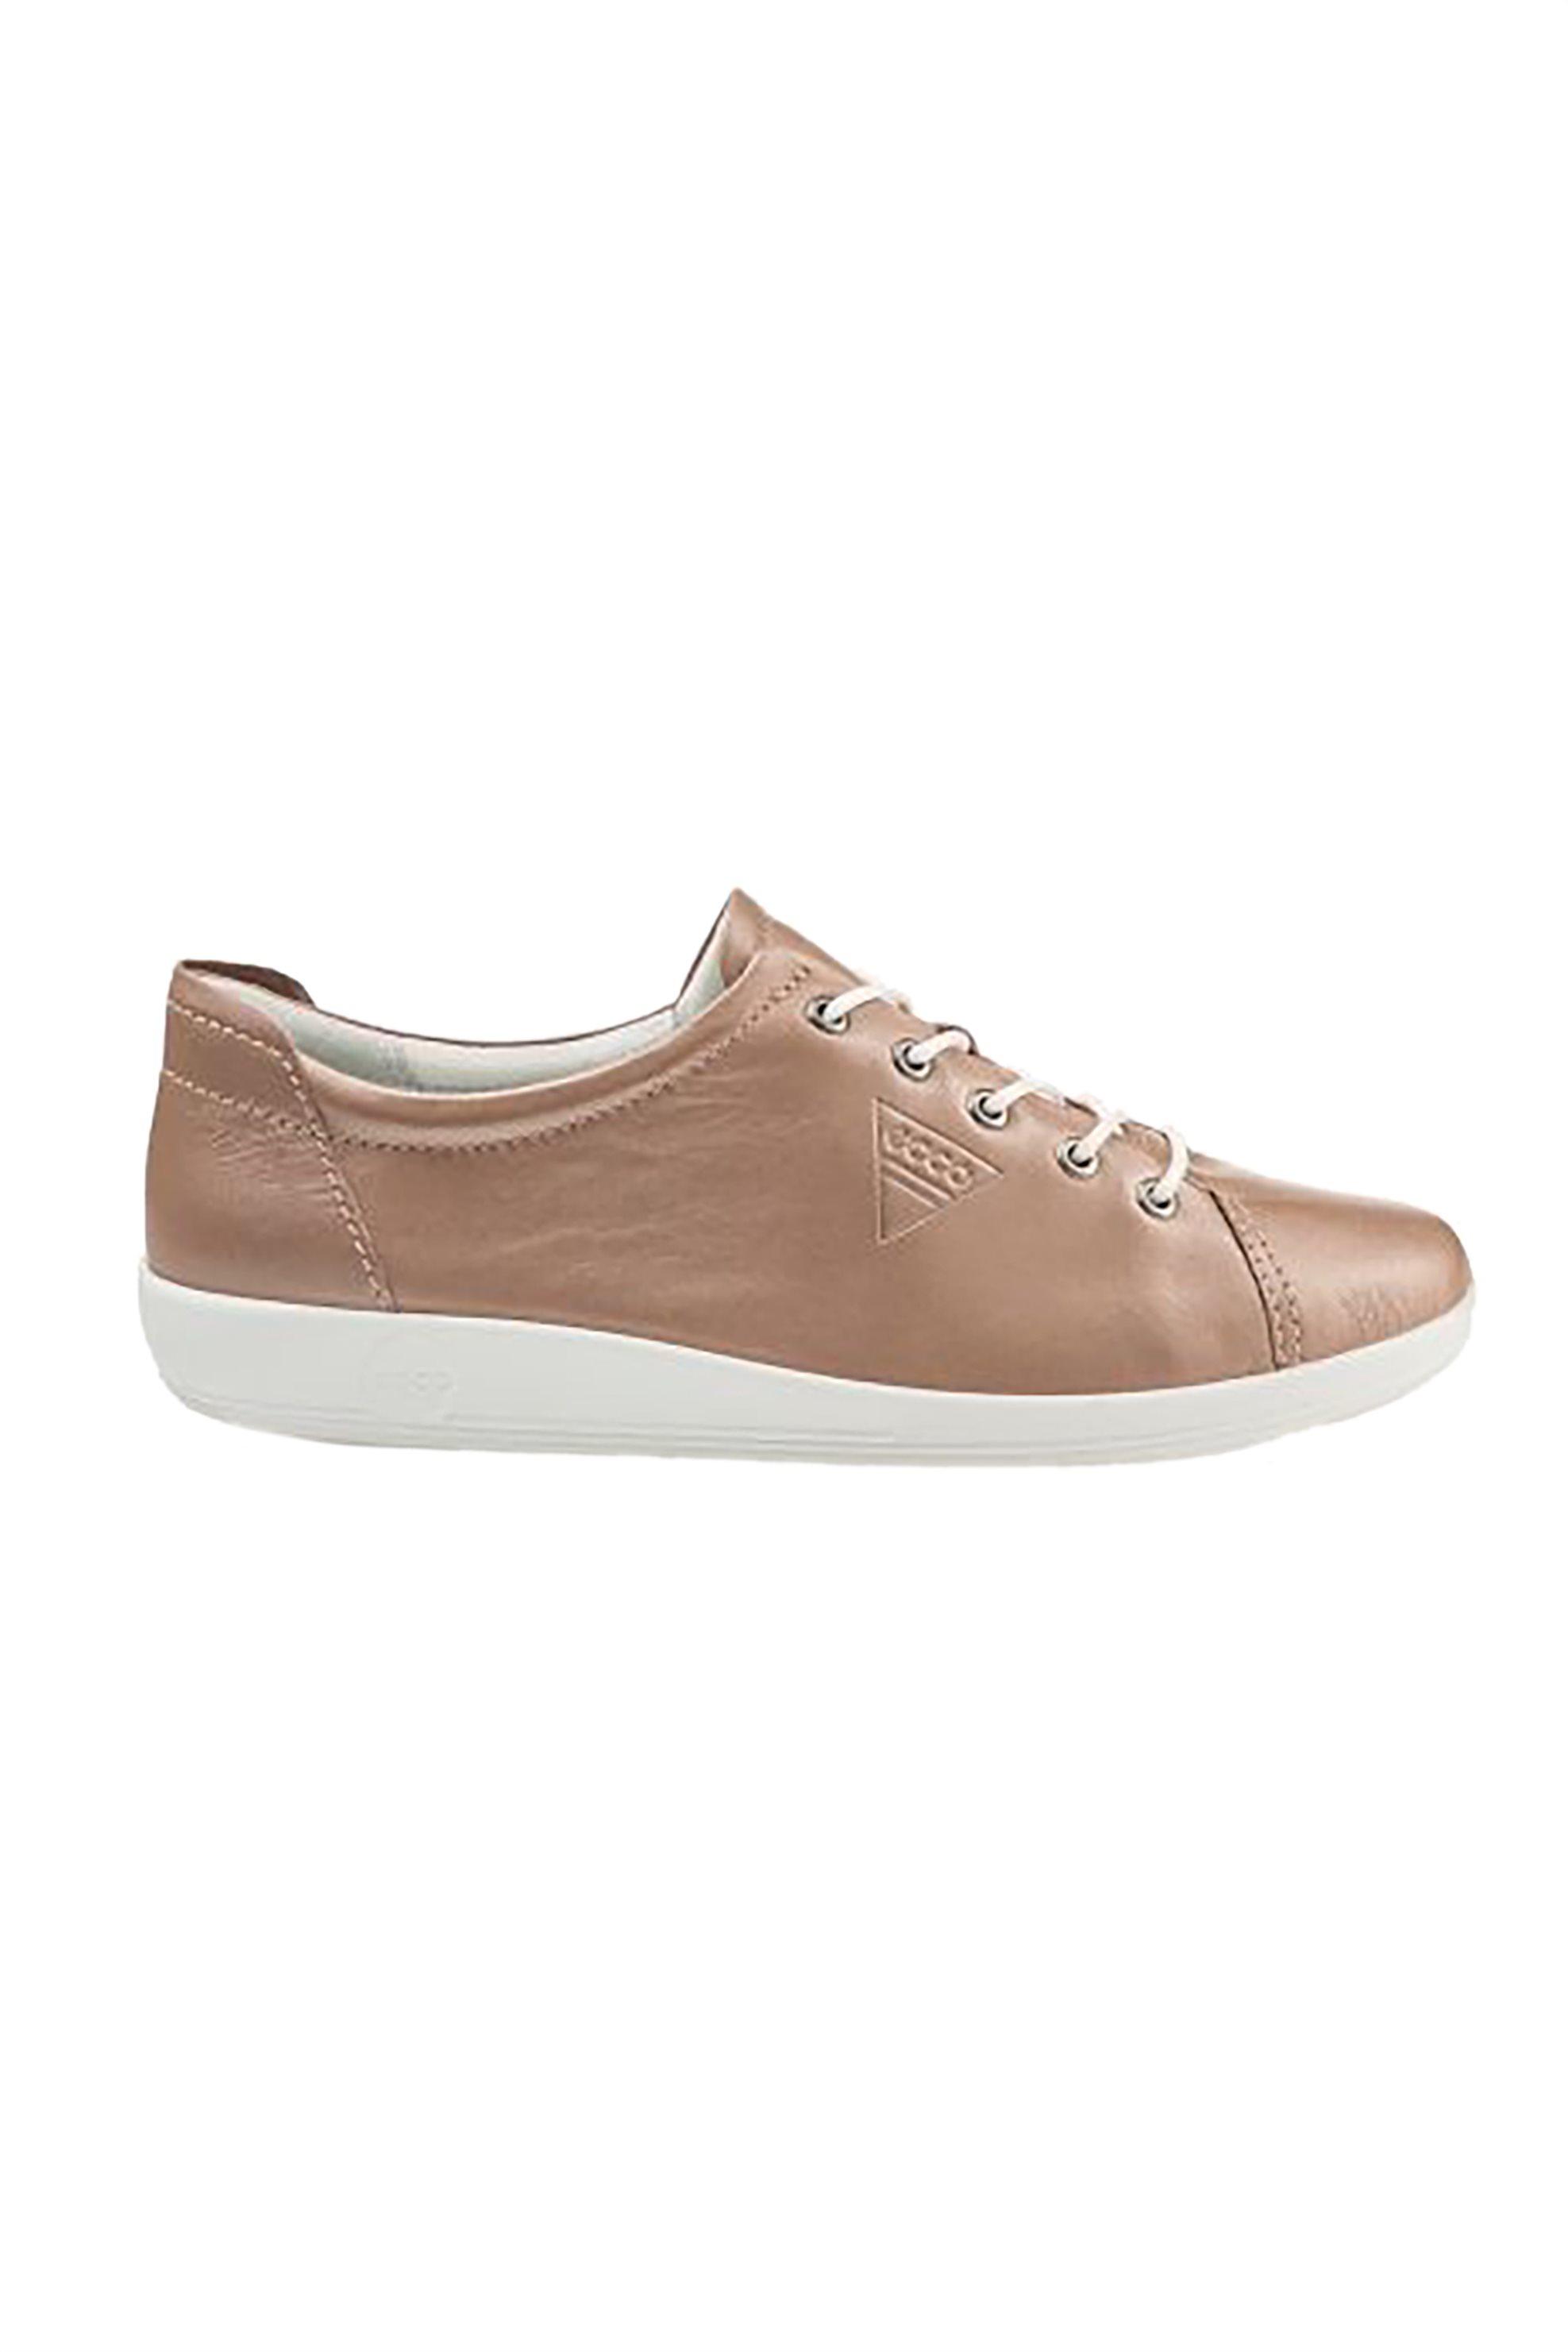 ECCO γυναικεία δερμάτινα sneakers με κορδόνια – 120989-206503 514 – Χρυσό